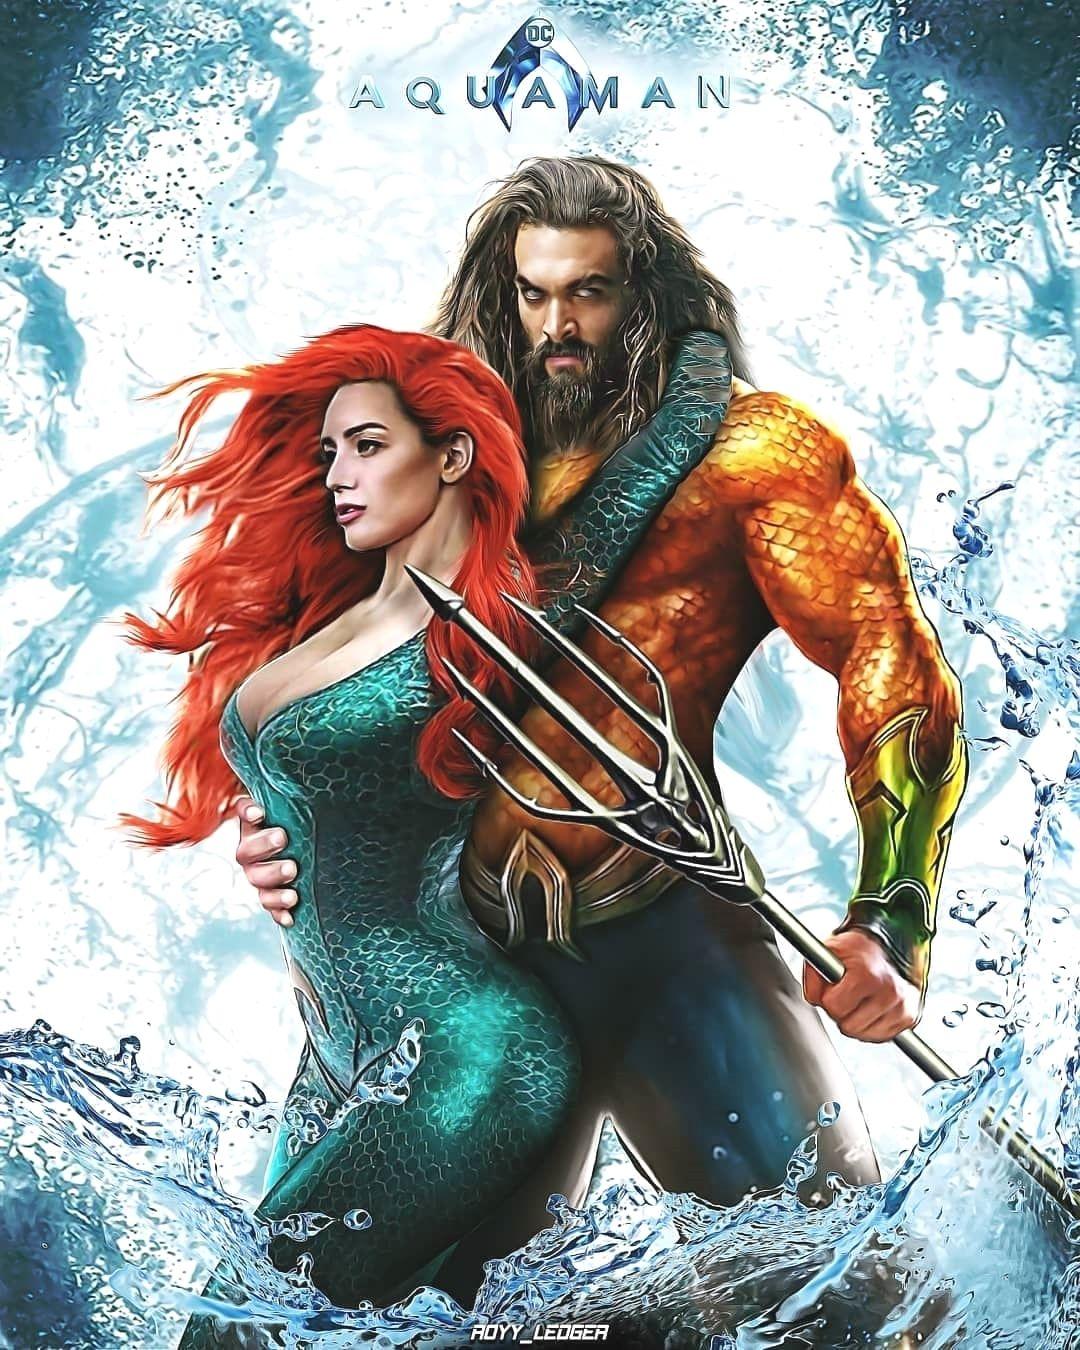 Aquaman Jason Momoa Mera Aquaman S Wifey Amber Heard: AQUAMAN And MERA 🦈🐳🦑 By Royy Ledger @royy_ledger #Aquaman